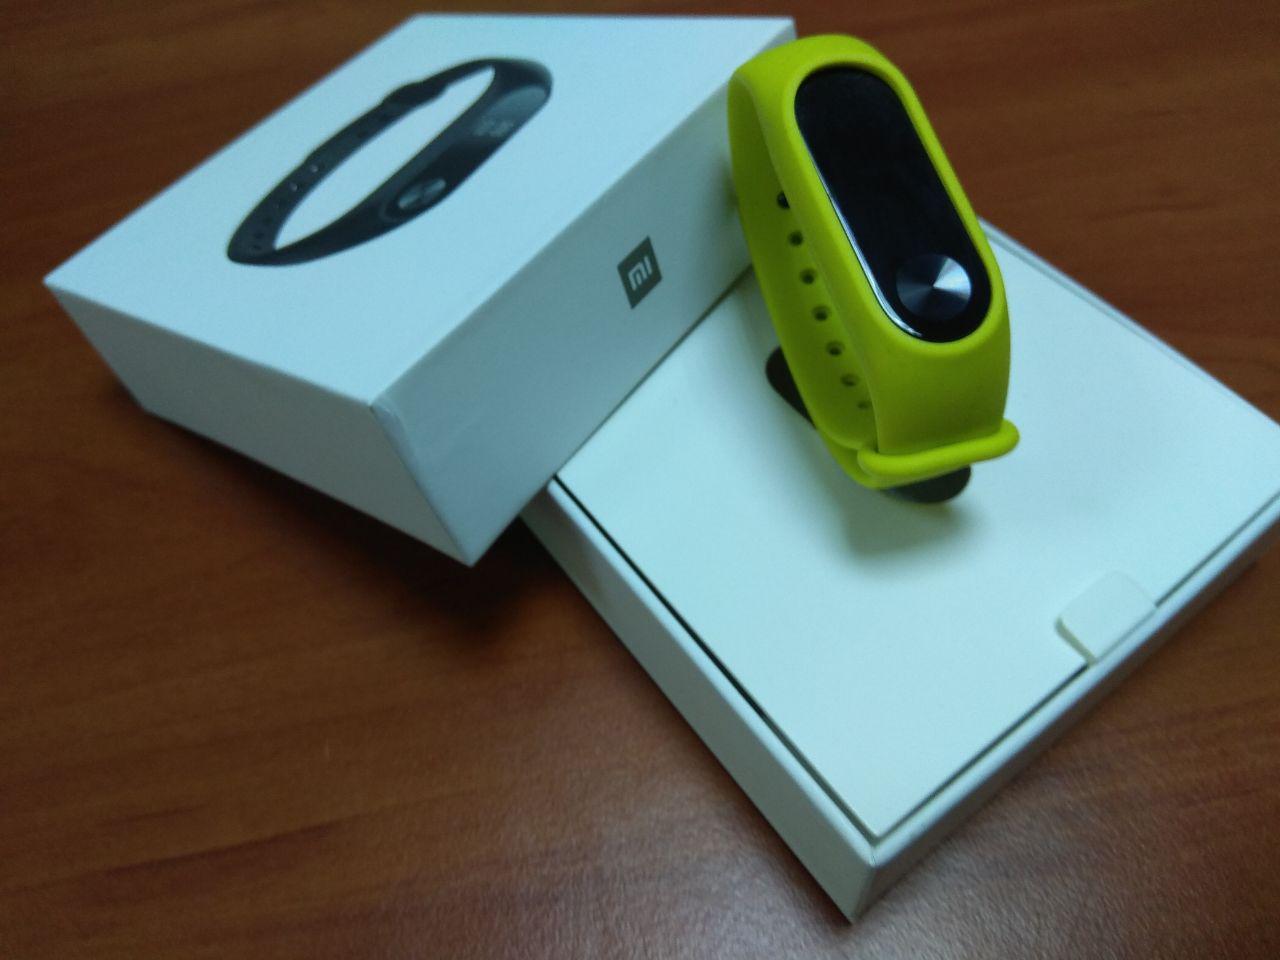 Фитнес-браслет Xiaomi Mi Band 2 (Black) ОРИГИНАЛ + ремешок (Green) Гарантия 3 месяца